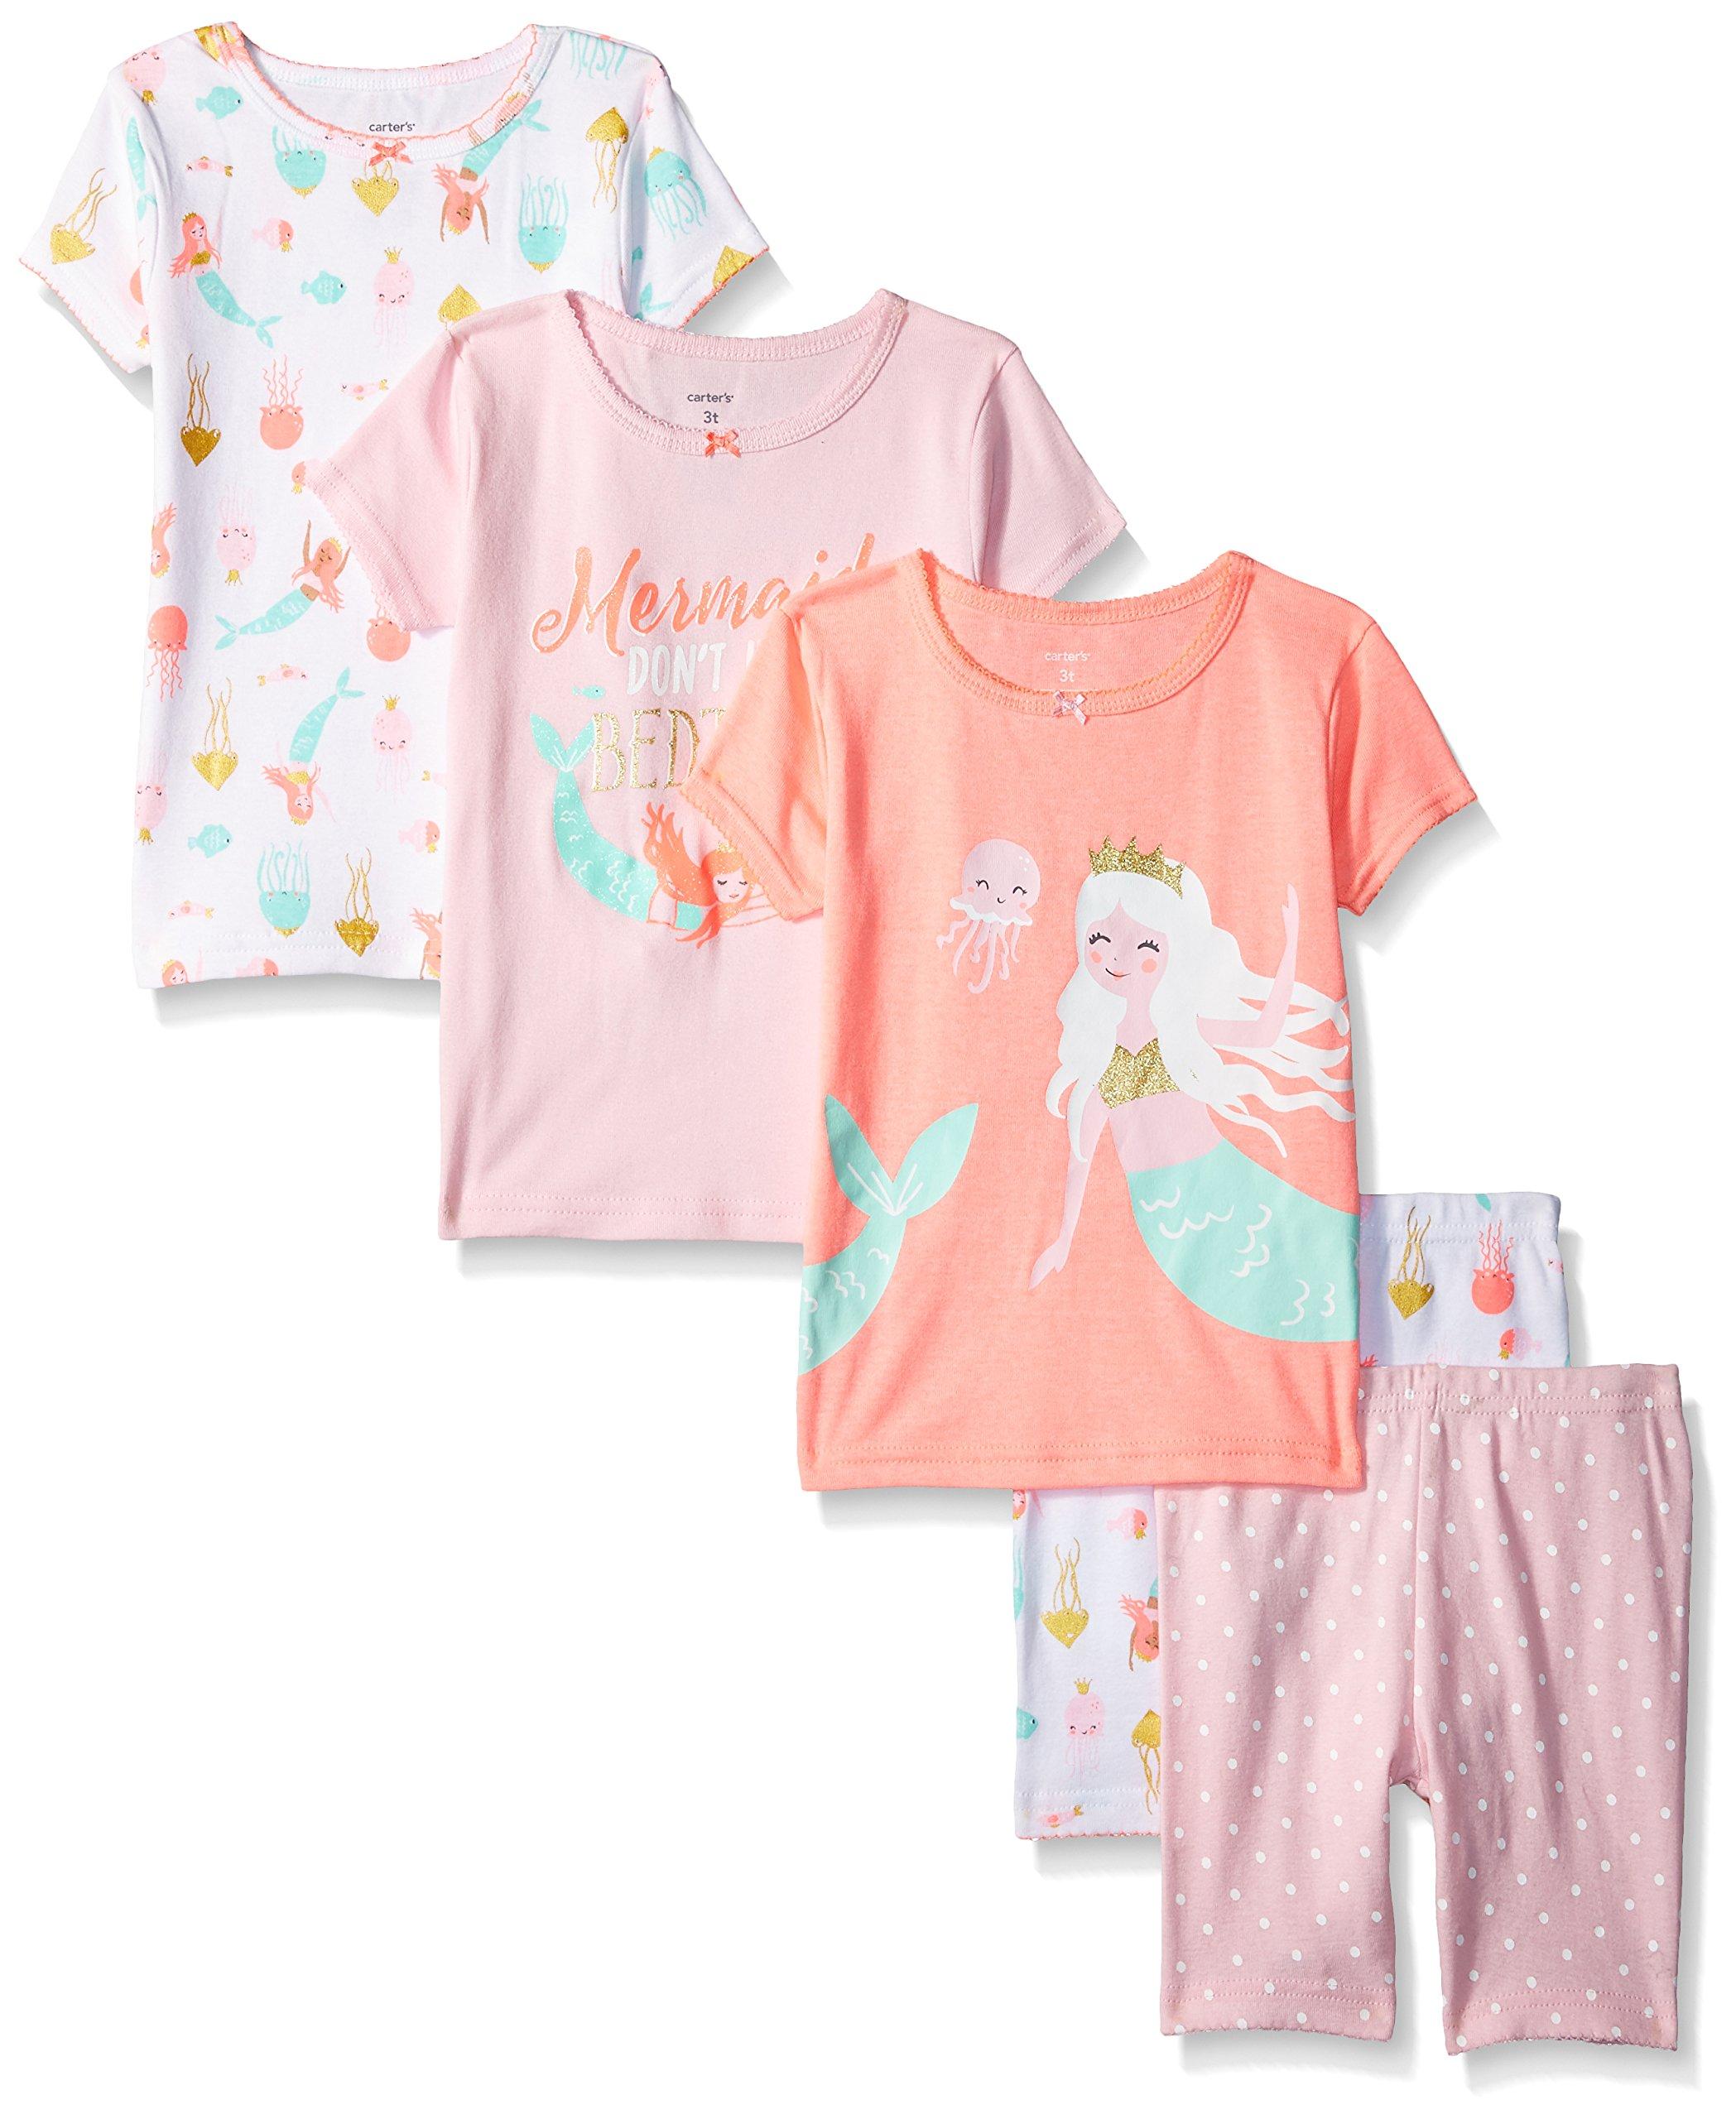 Carter's Baby Girls' 5-Piece Cotton Snug-Fit